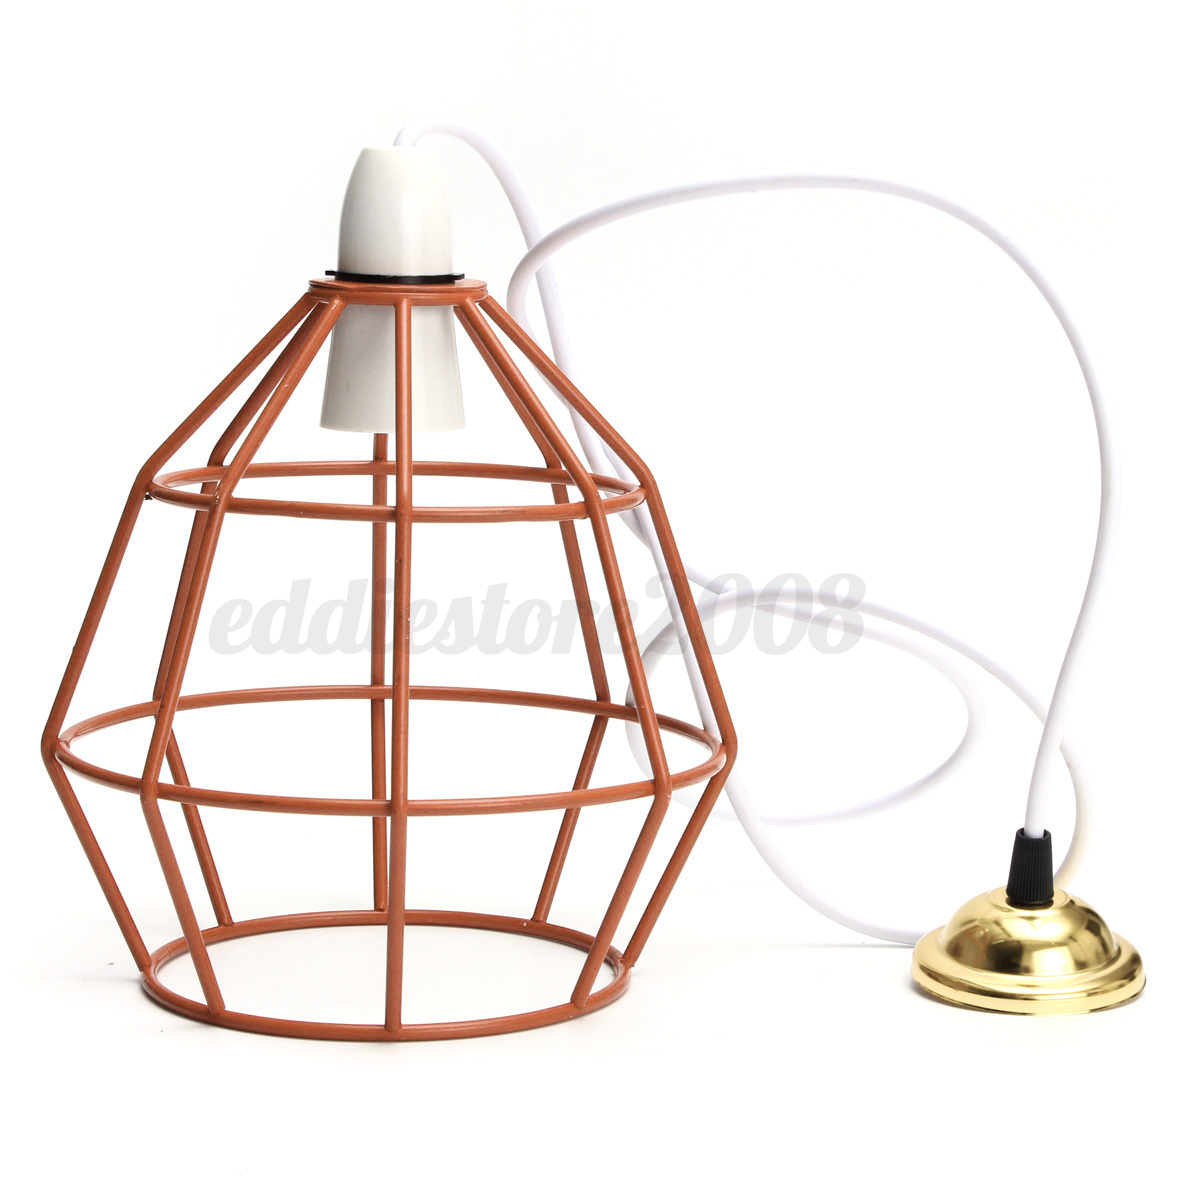 industrial vintage style metal cage wire frame ceiling. Black Bedroom Furniture Sets. Home Design Ideas